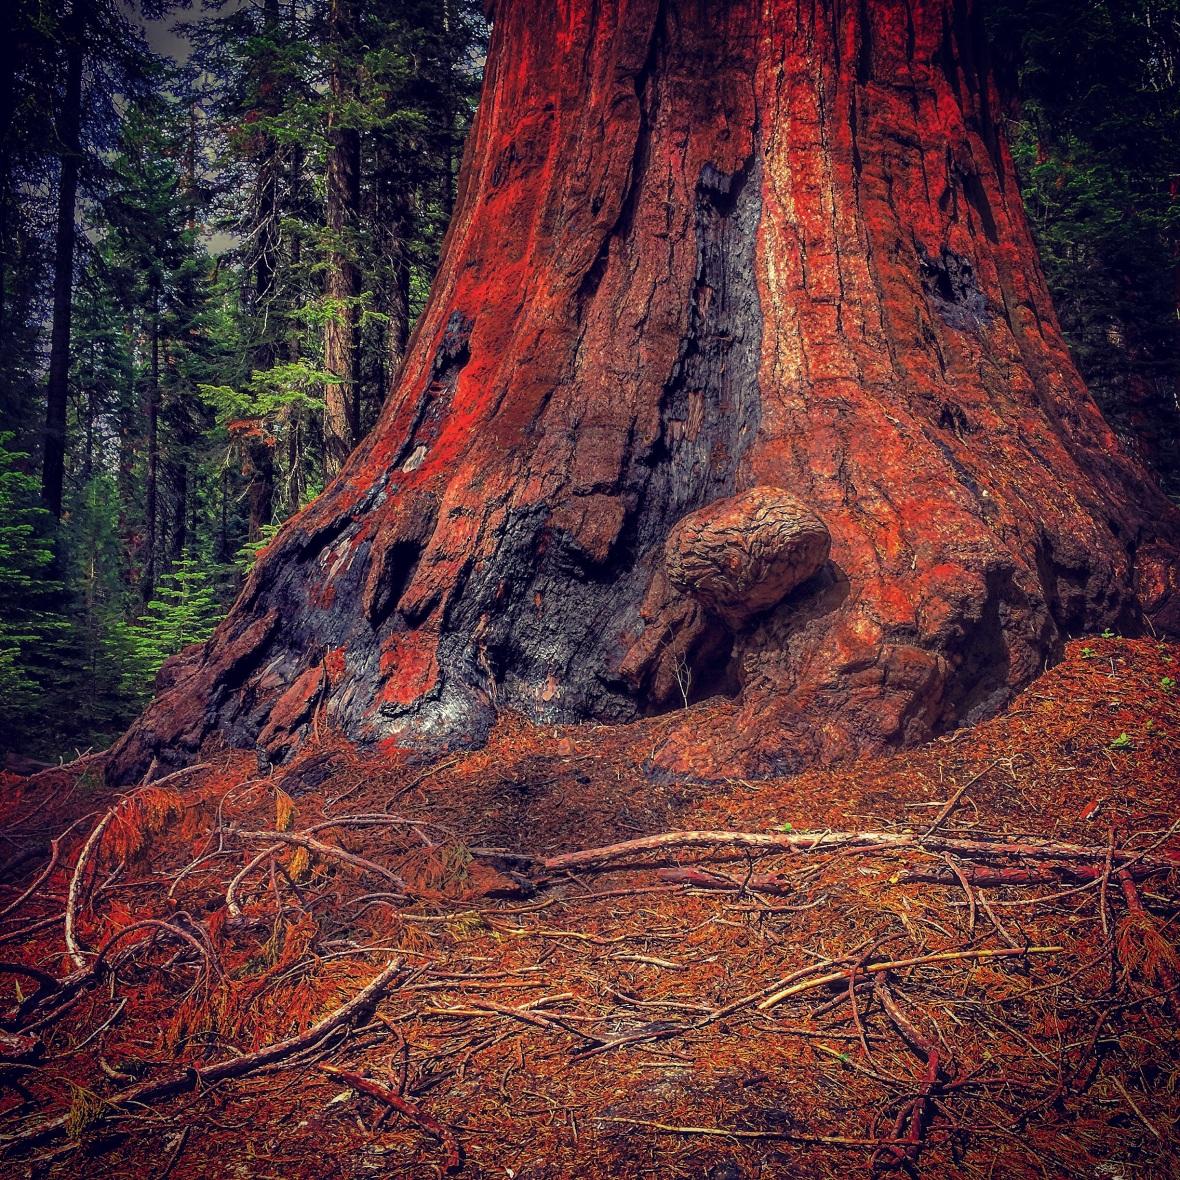 """HUGE Tree - Trust Me"" (Sequoia National Park)"